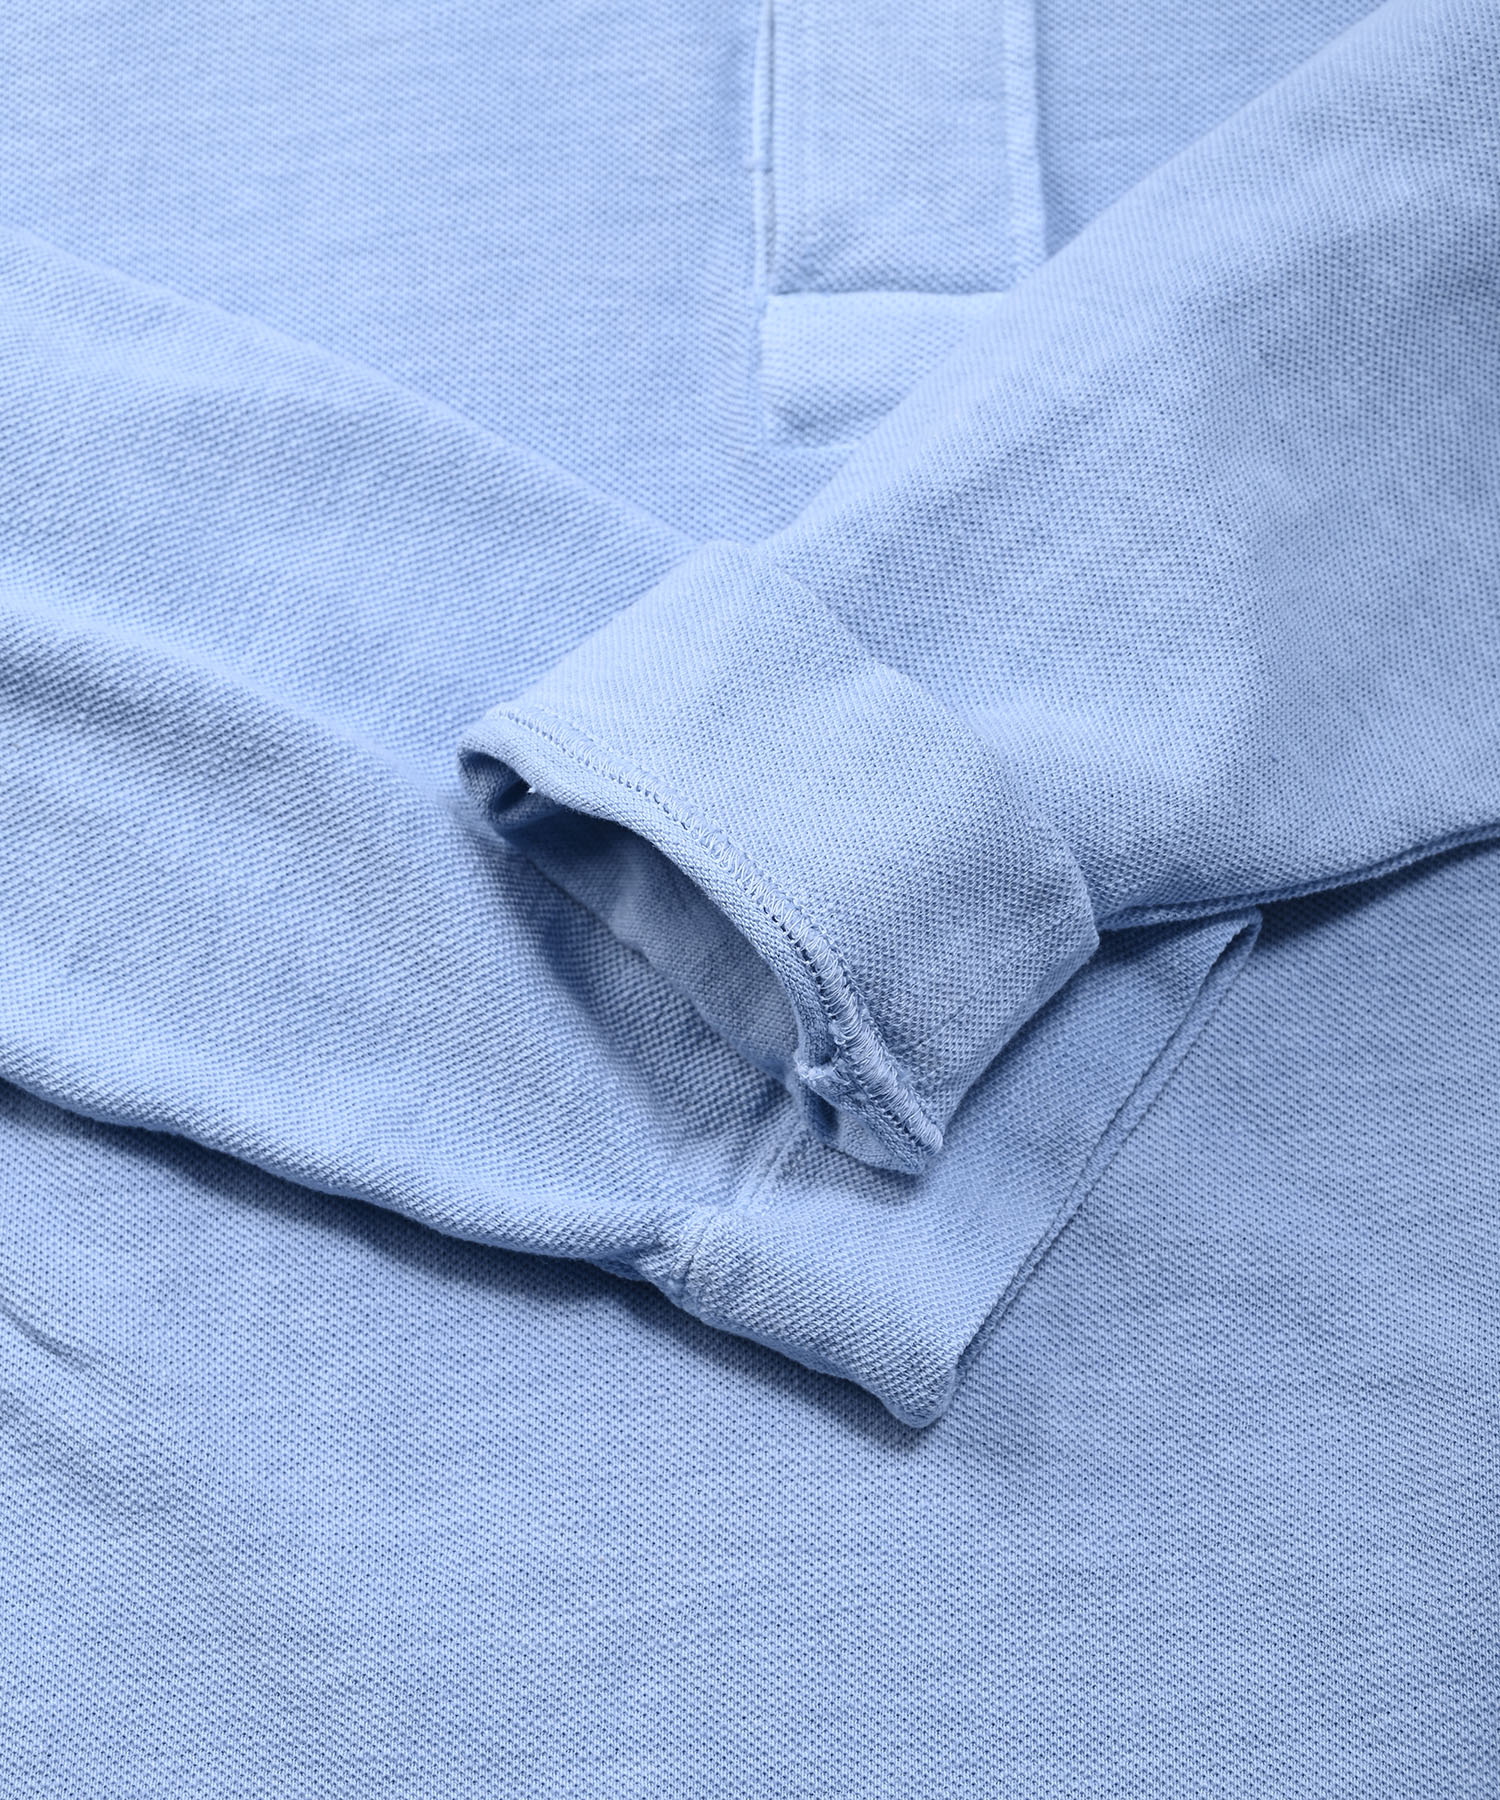 Kanoko Ocean Shiokaze Long-sleeved Polo Shirt (0421)-9